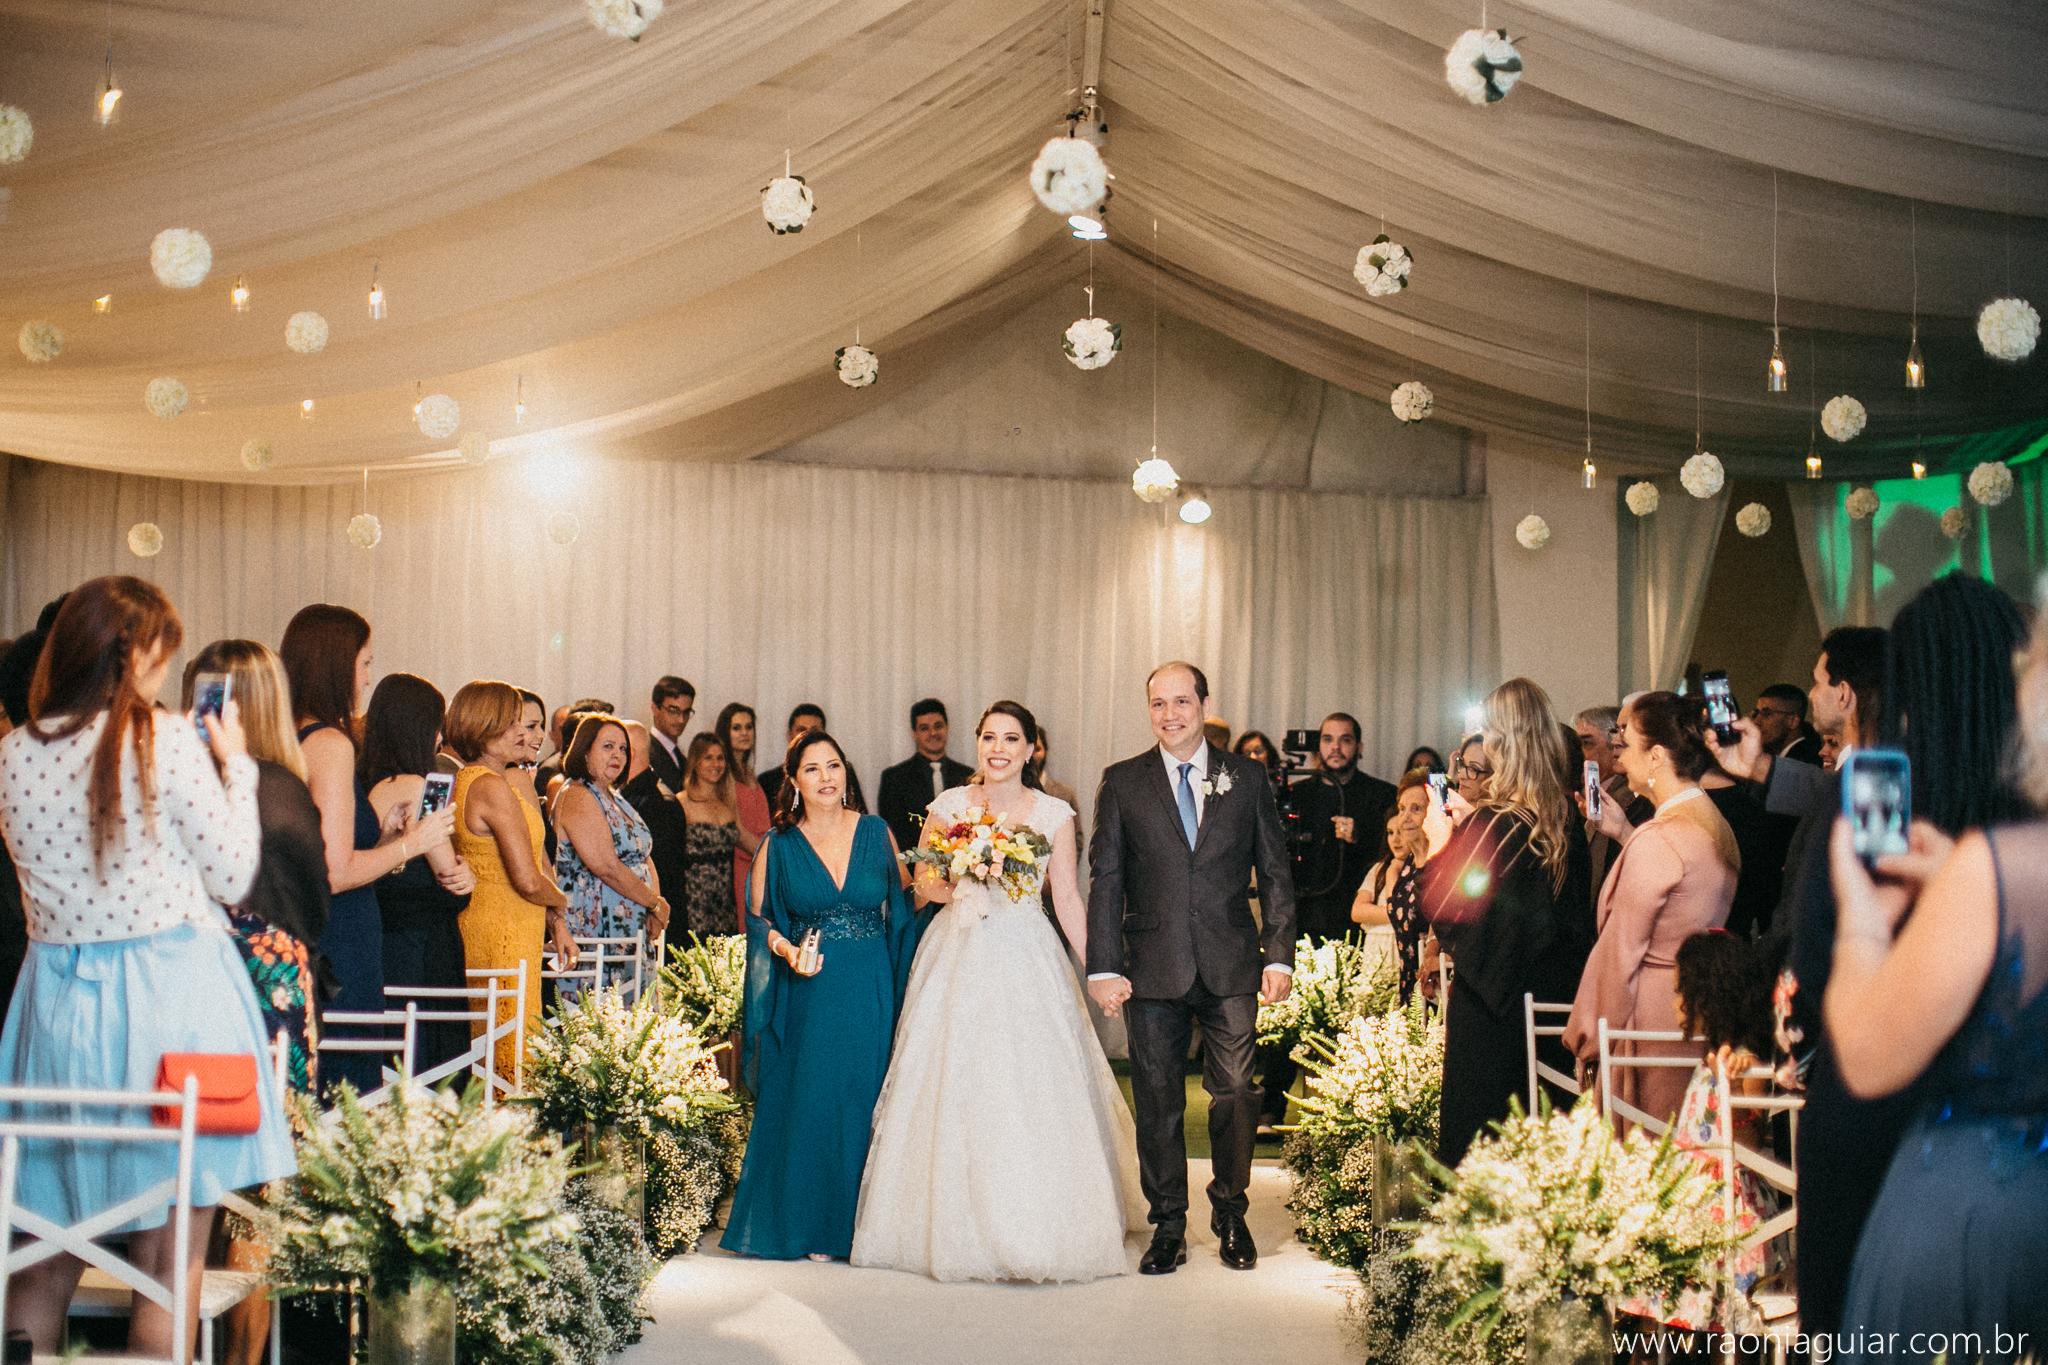 2018.10 Casamento Rebeca Soares e Felipe 0245.jpg